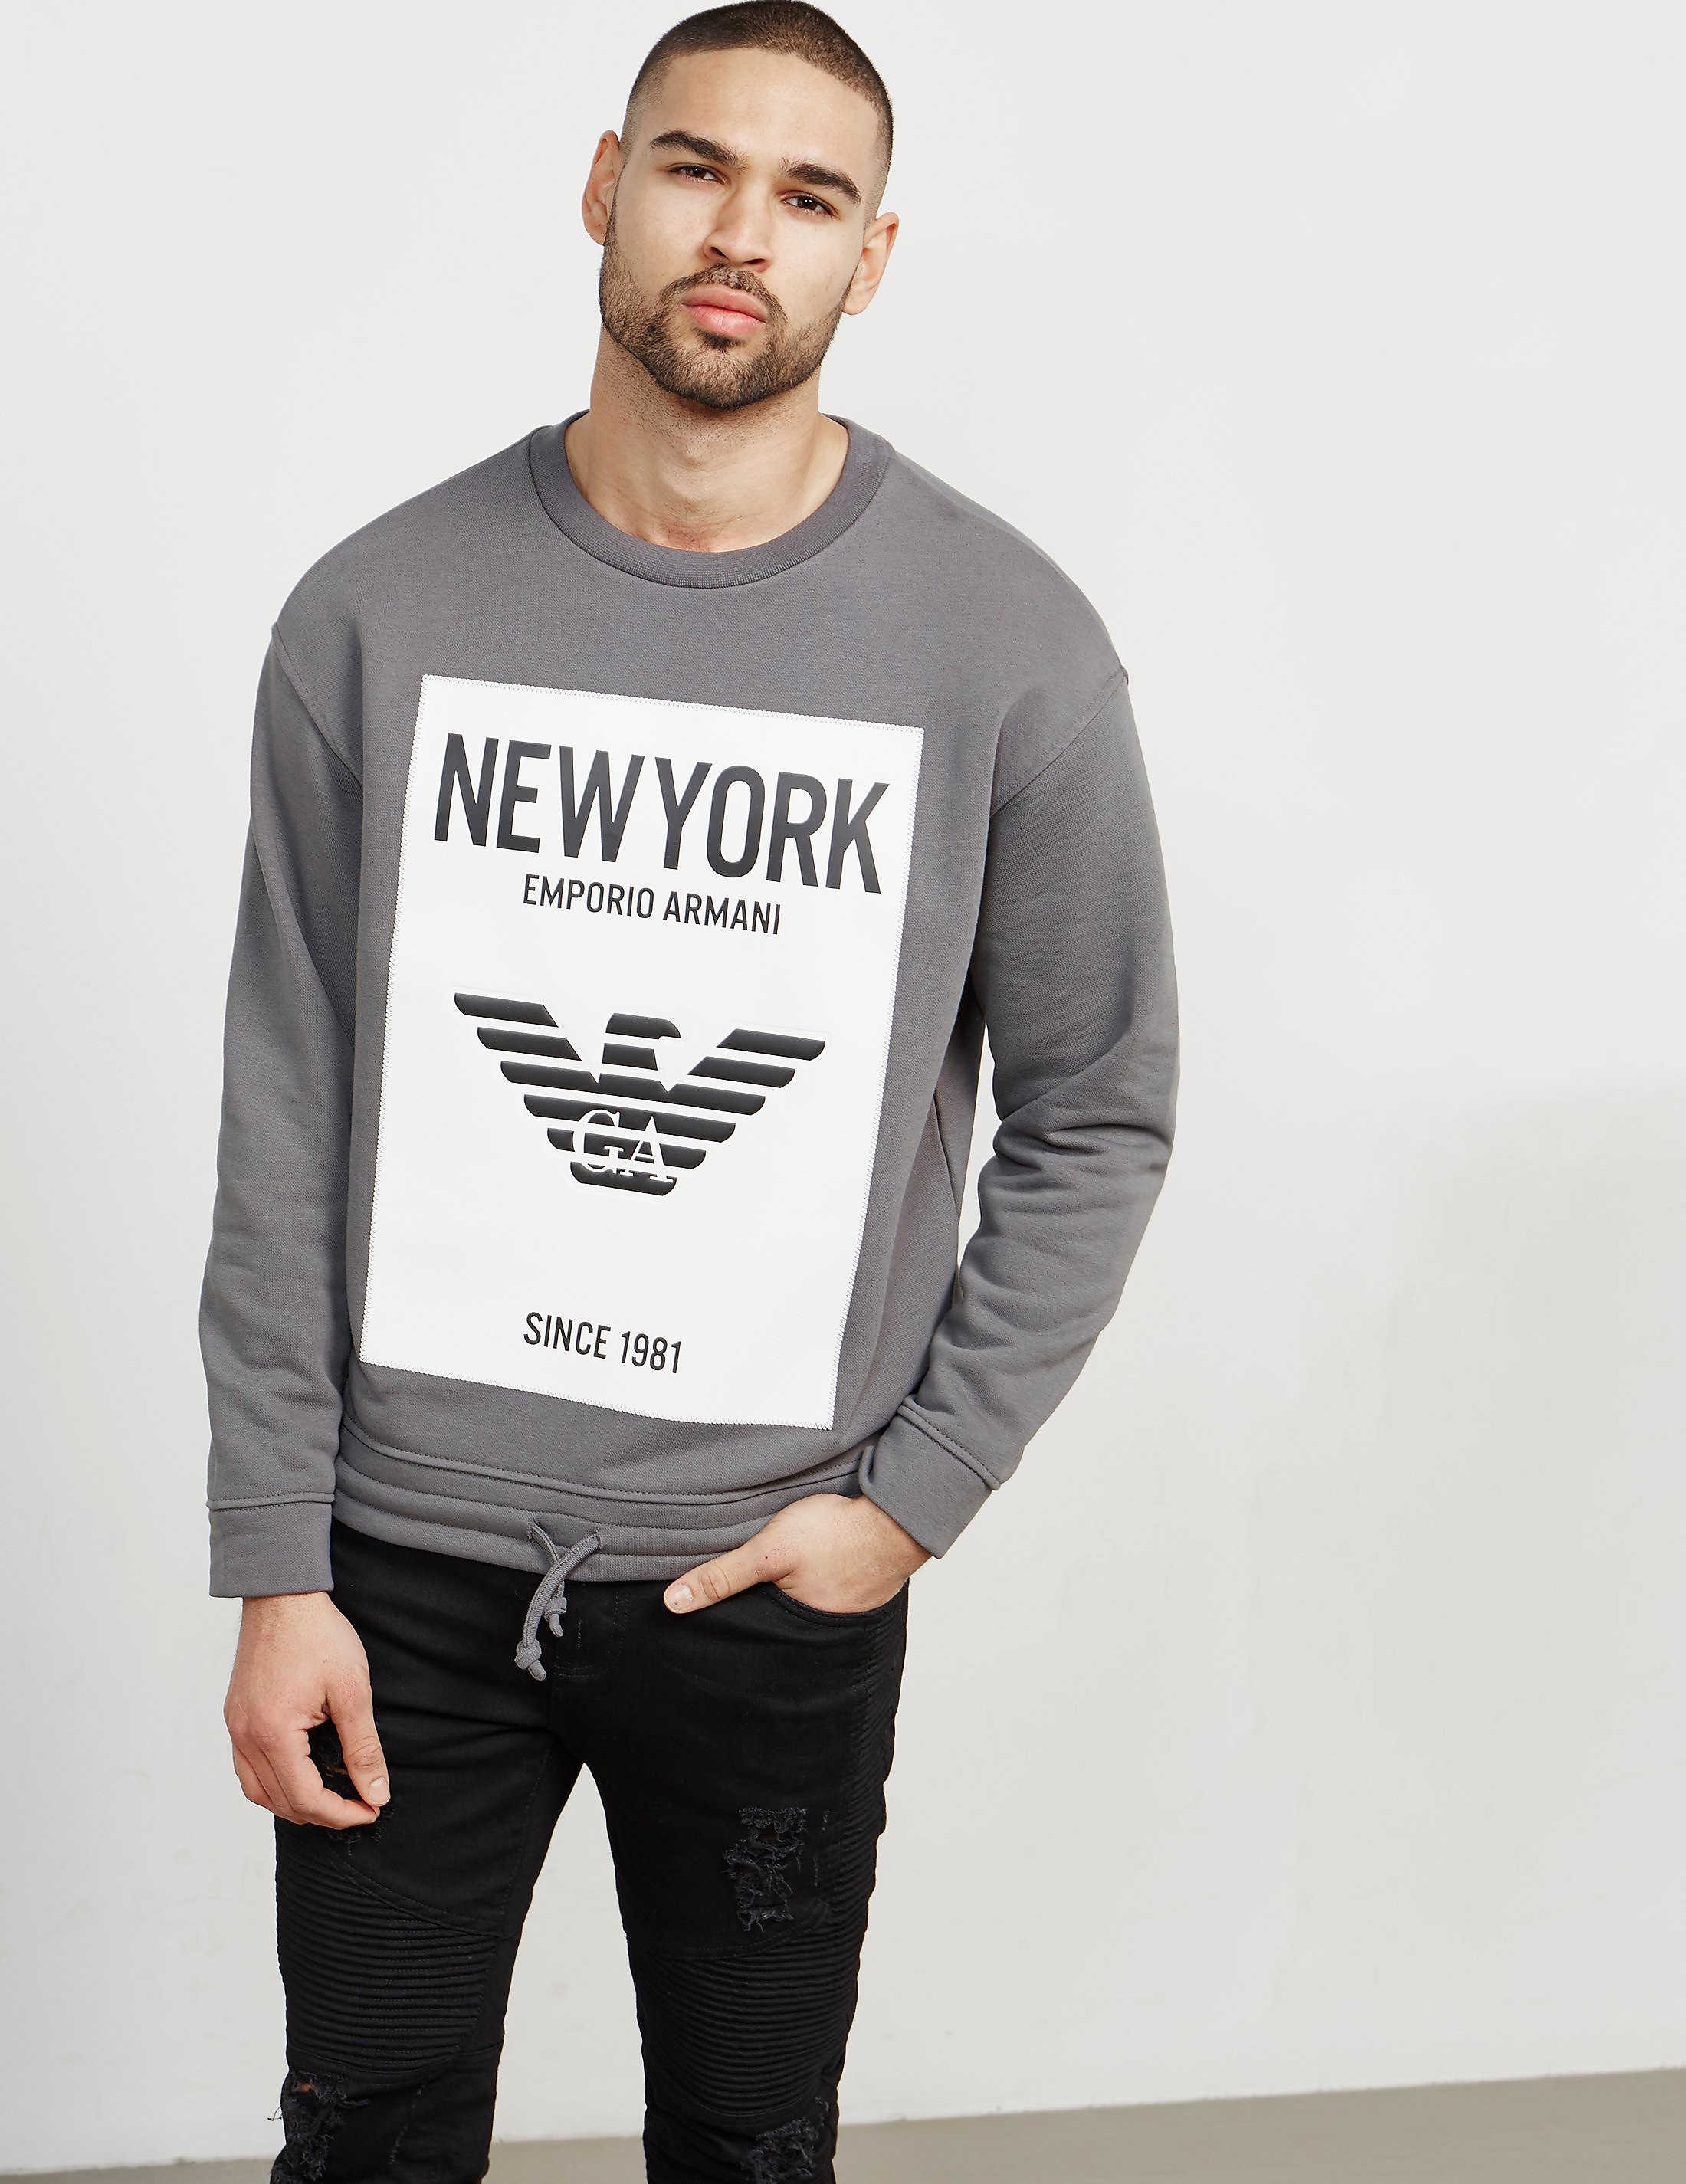 Emporio Armani New York Sweatshirt